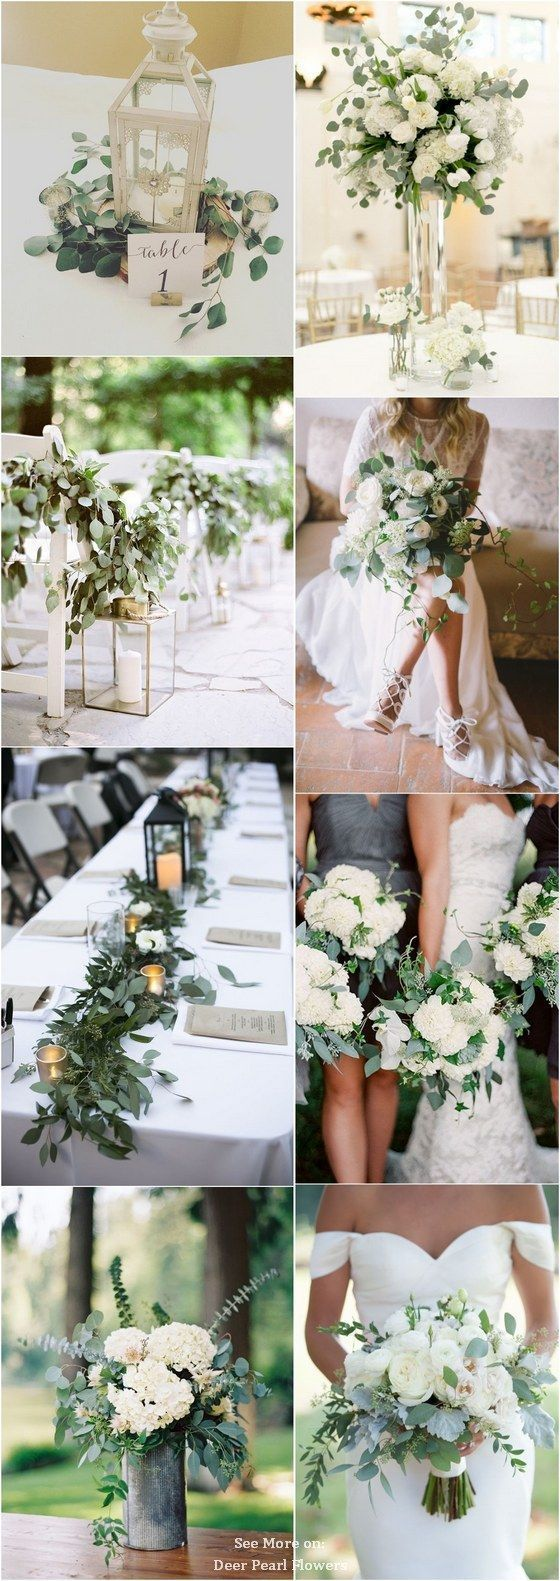 Wedding decoration ideas blue and white   best Wedding decorations images on Pinterest  Weddings Wedding